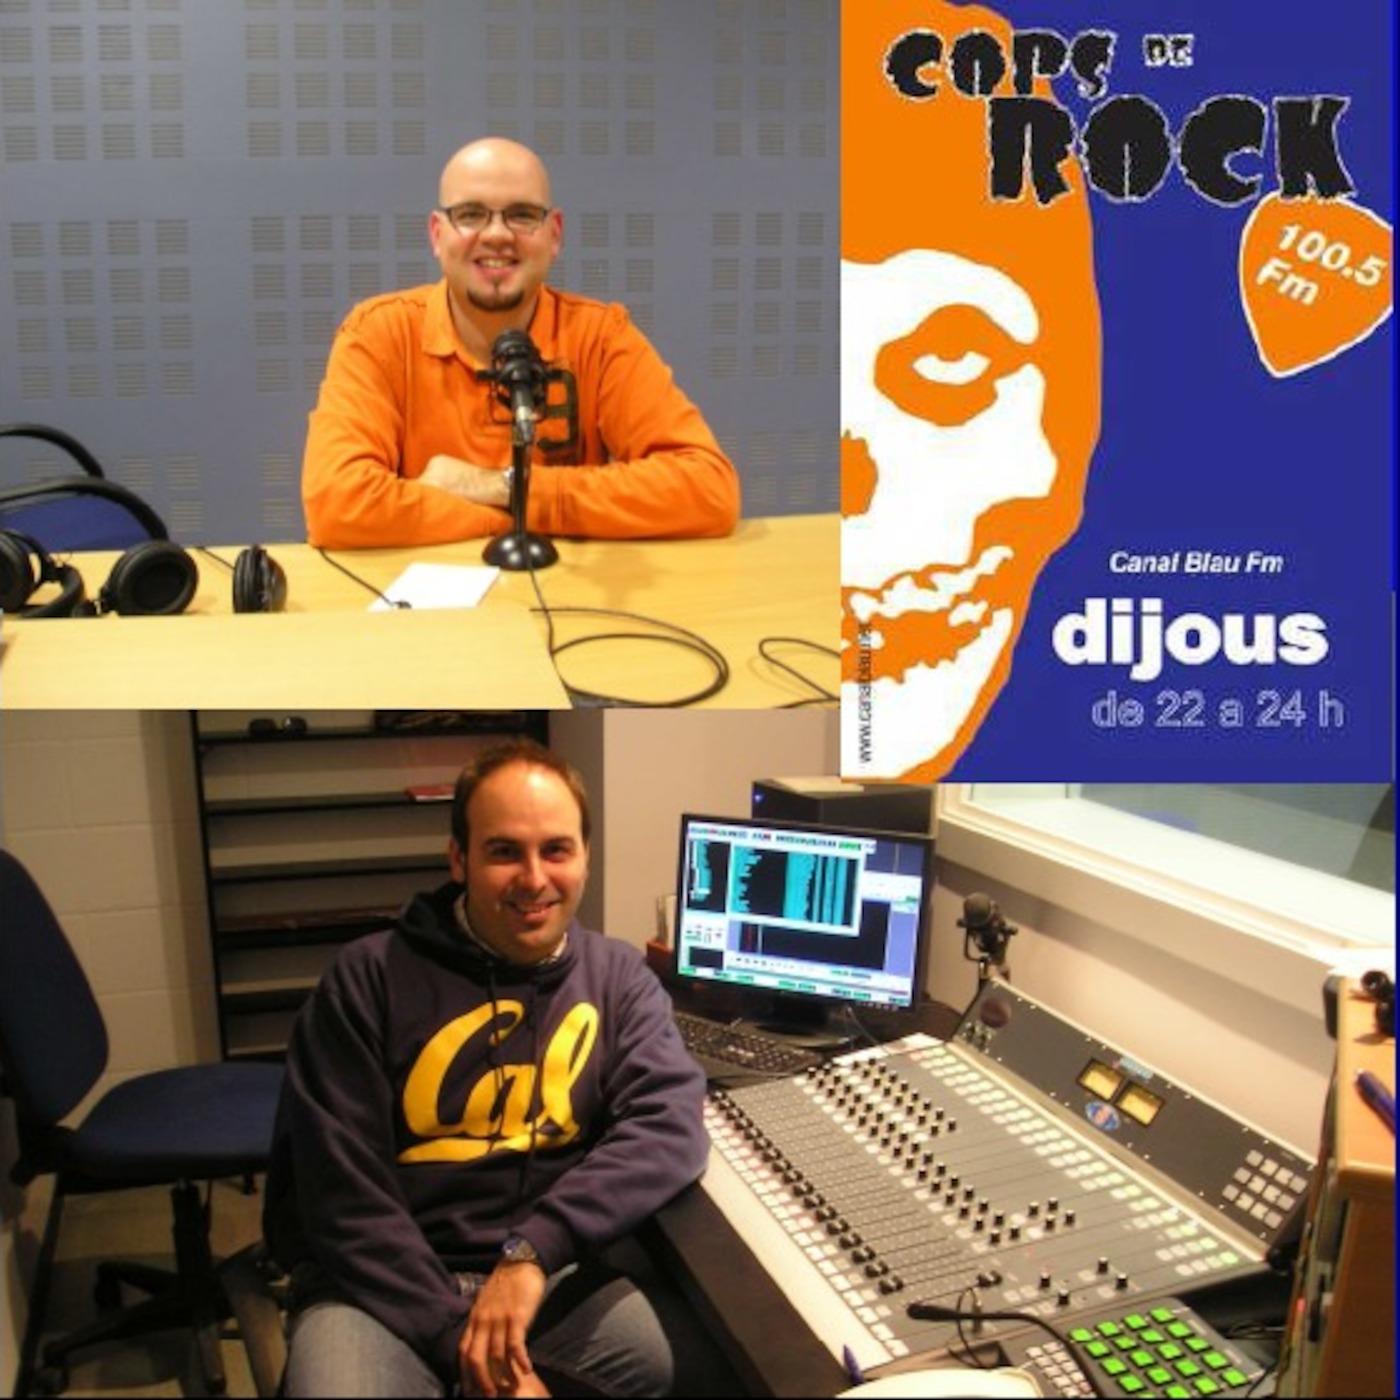 COPS DE ROCK